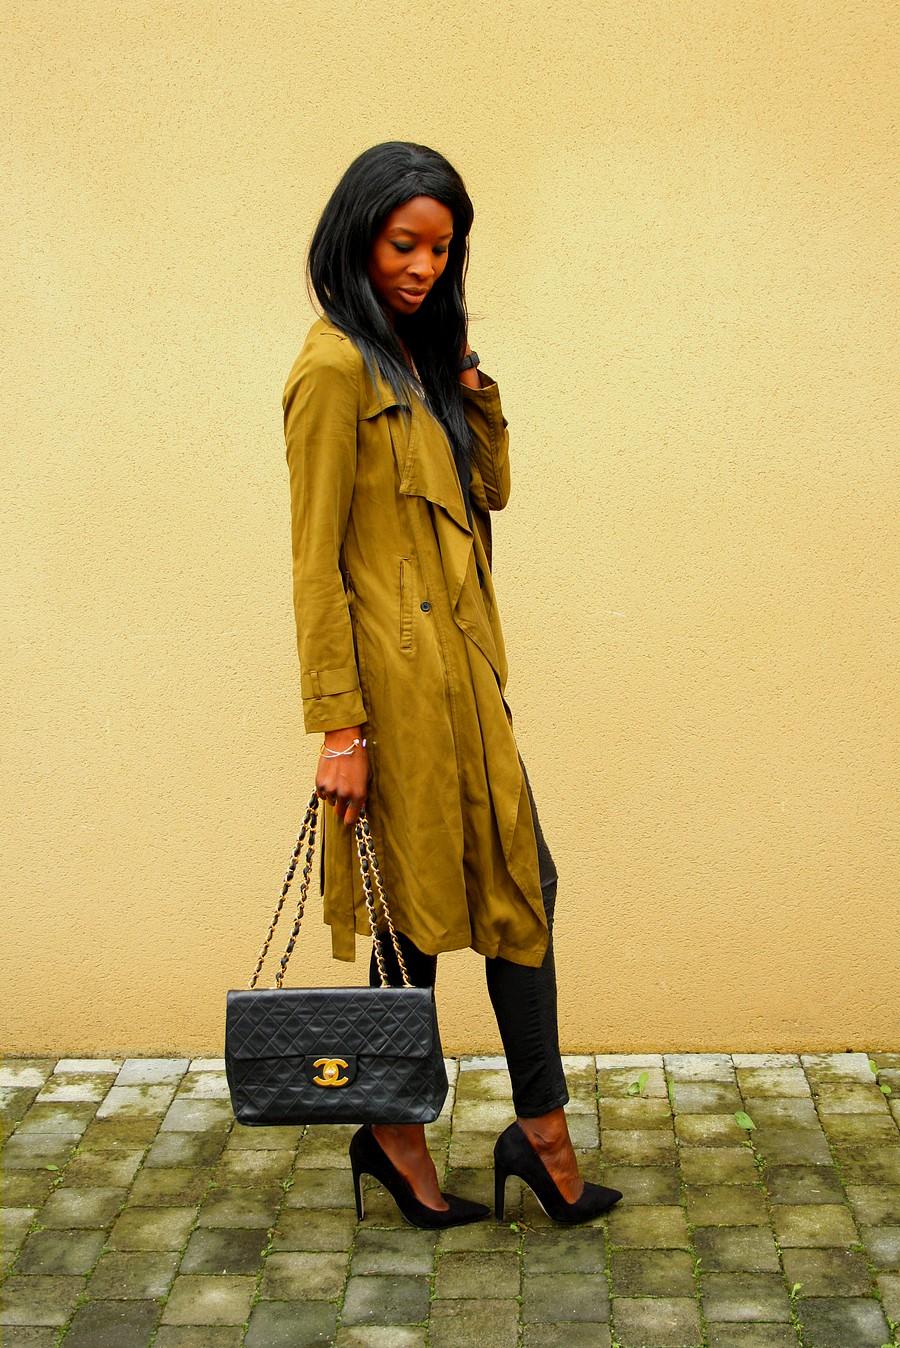 ootd-kakistyle-chanel-classic-flap-bag-vintage-blogger-style